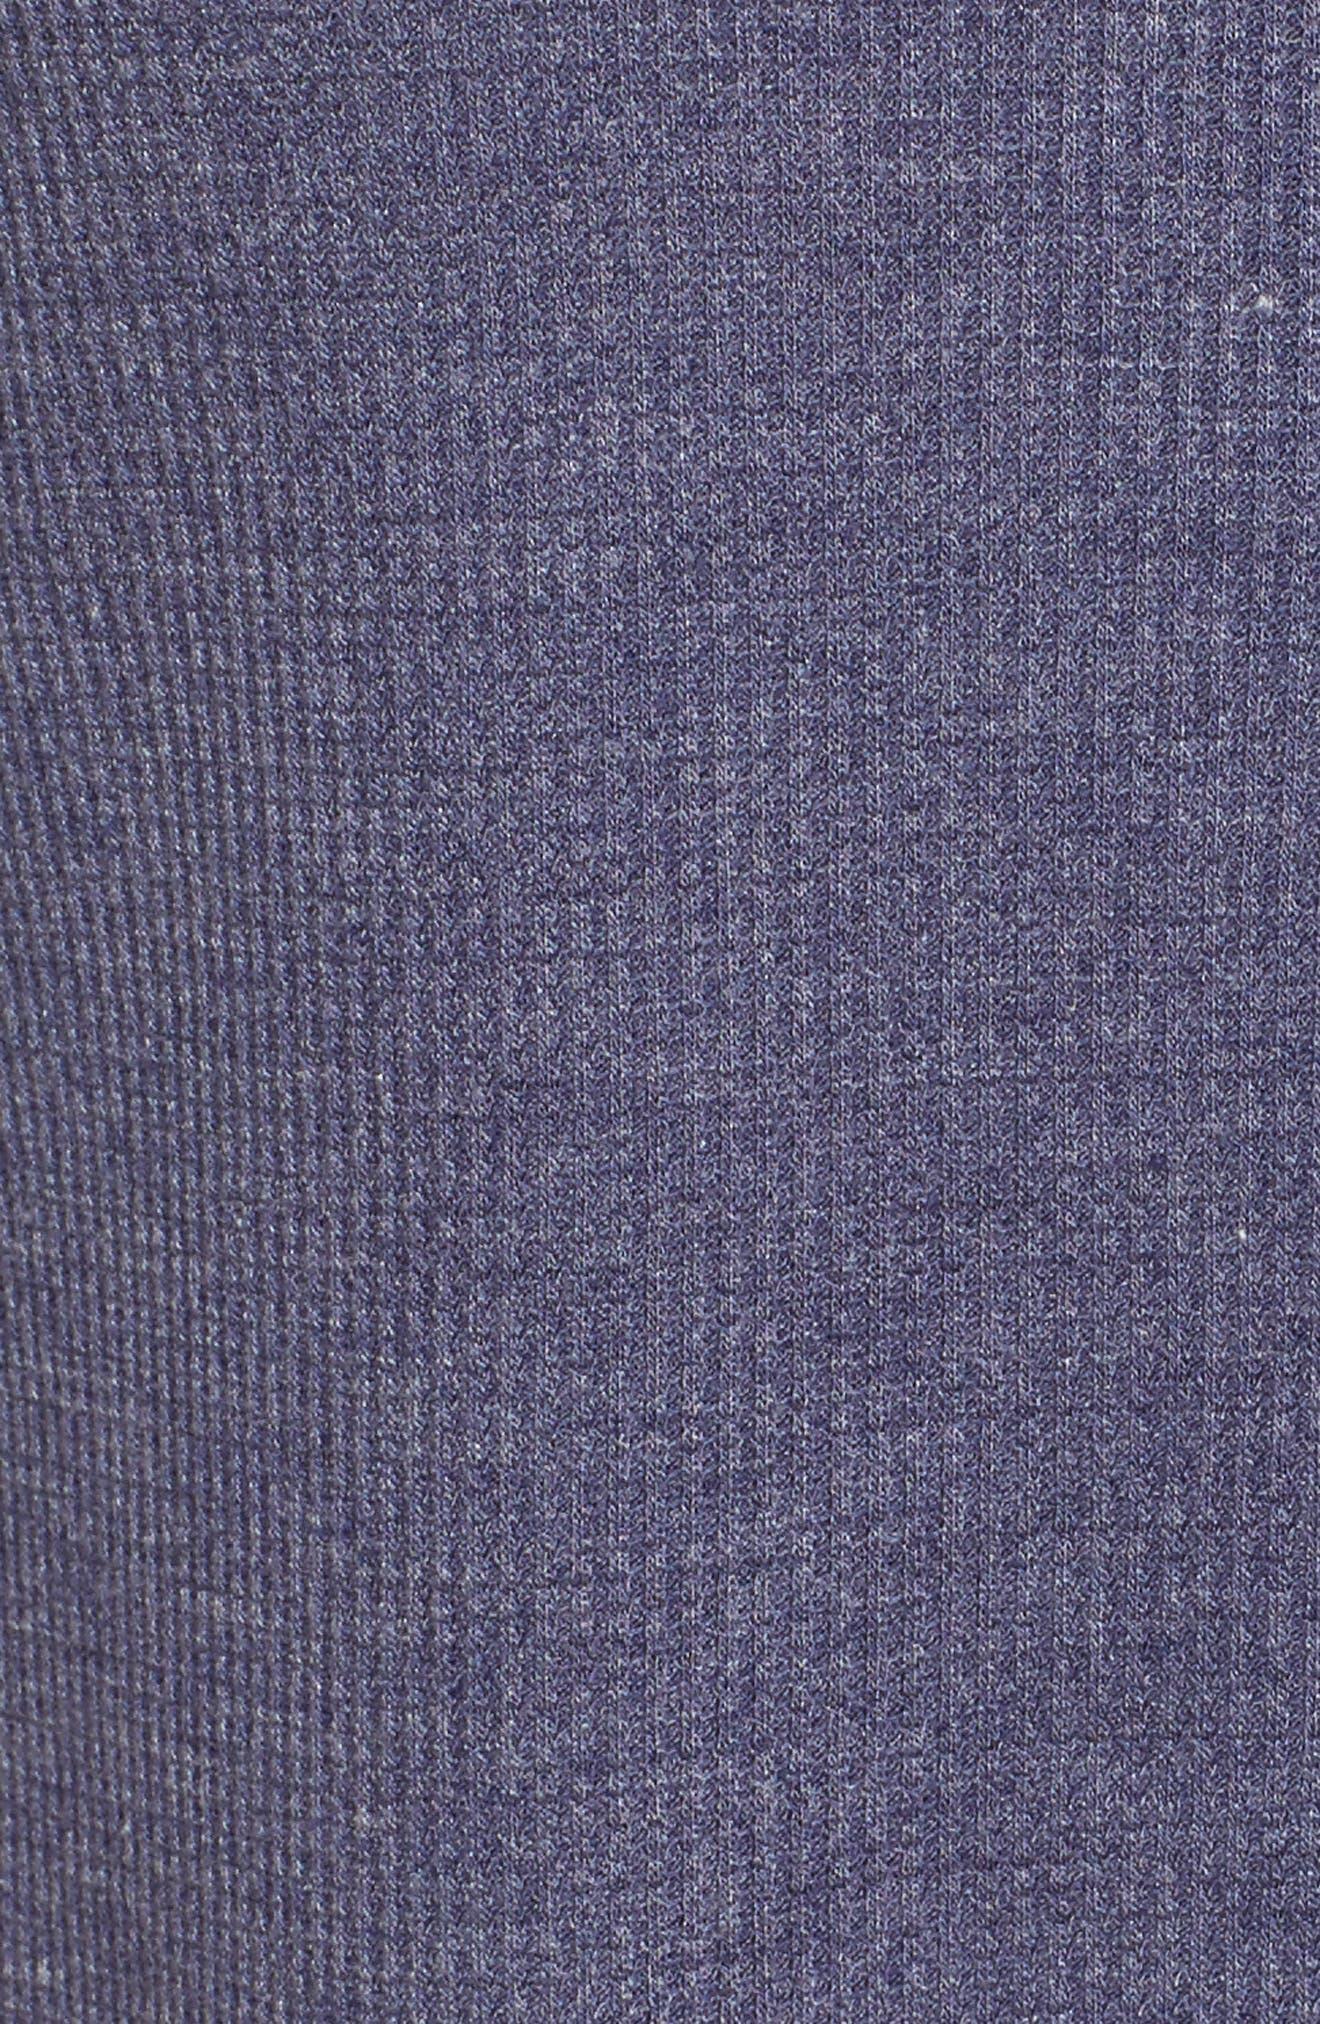 Sleep Shirt,                             Alternate thumbnail 17, color,